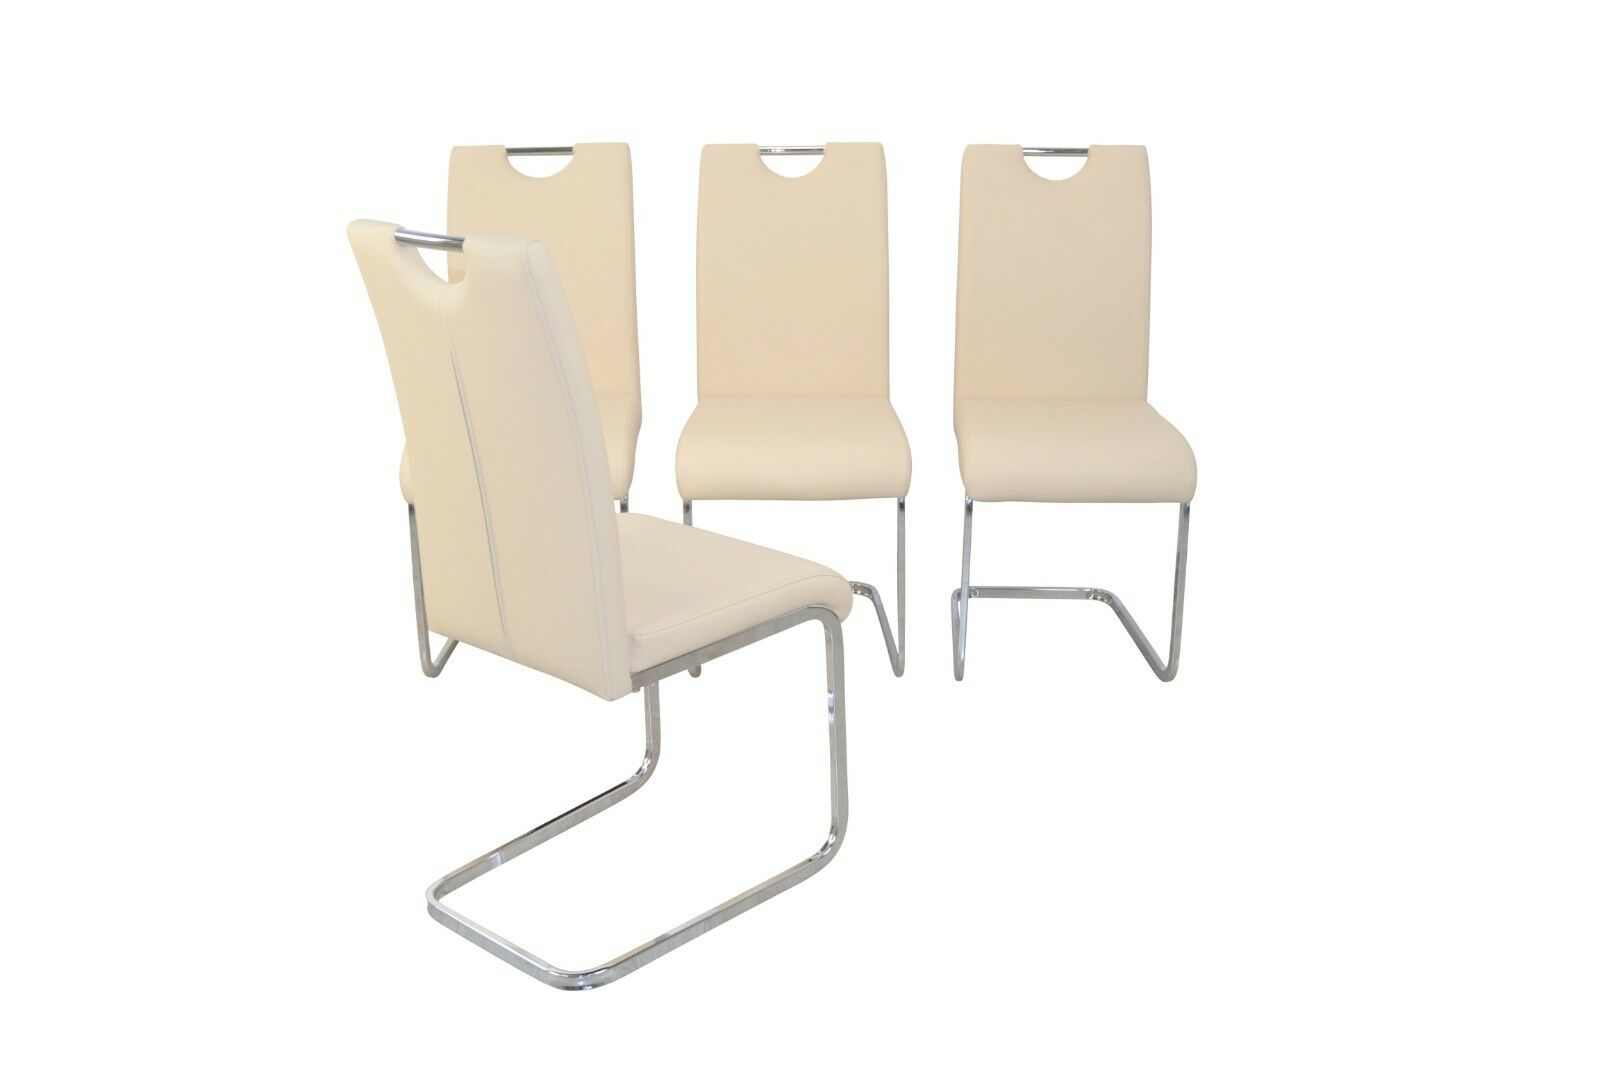 Schwingstuhl Esszimmerstühle Creme 4 Schwinger X Stuhlset Design Modern Griff TFl1JcK